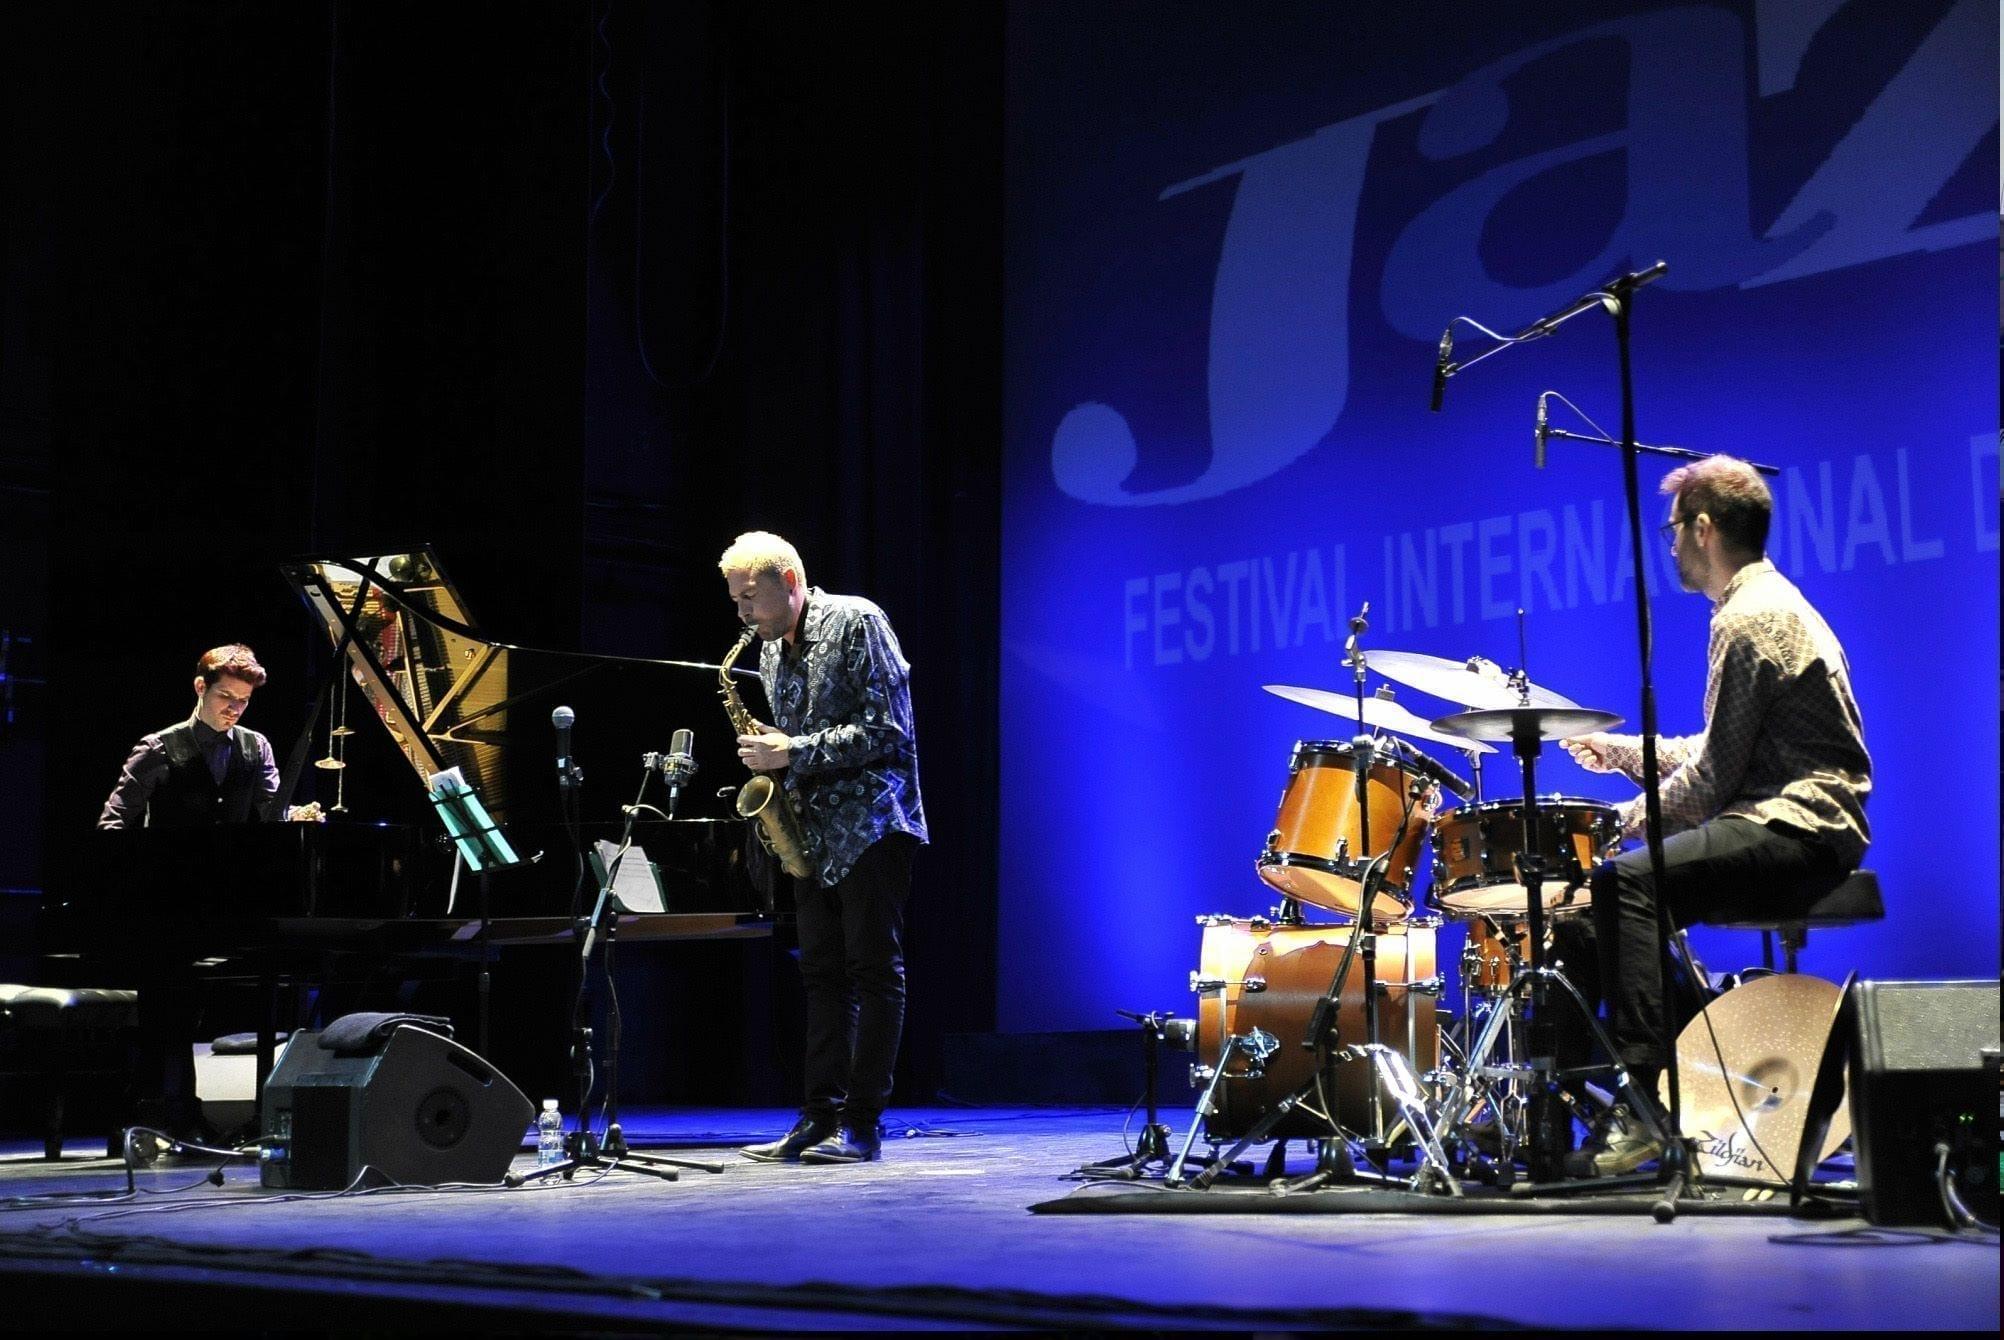 Chamber Jazz M•A•P Mezquida, Aurignac, Prats